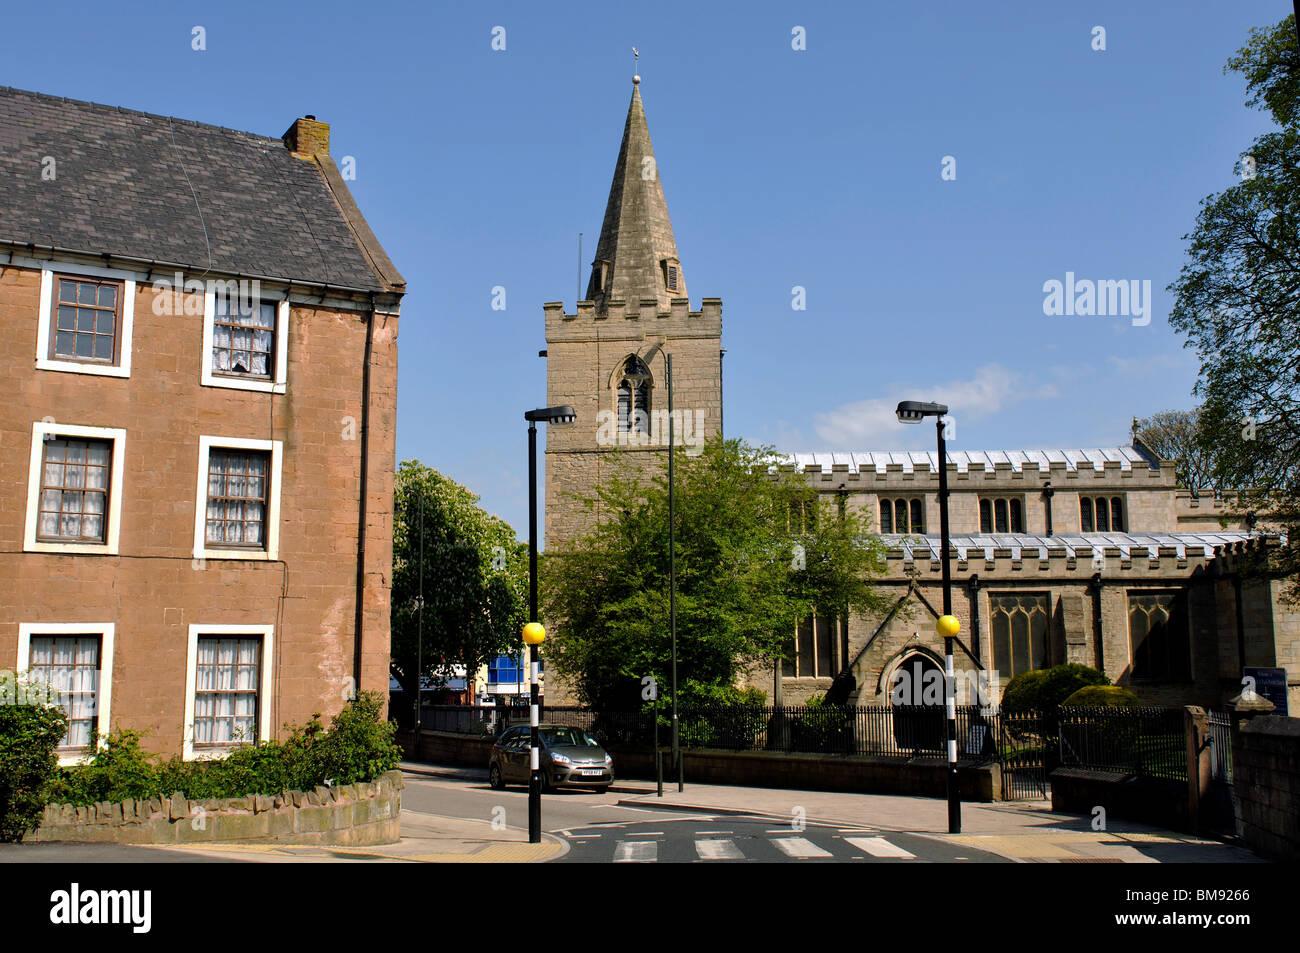 Mansfield nottinghamshire united kingdom